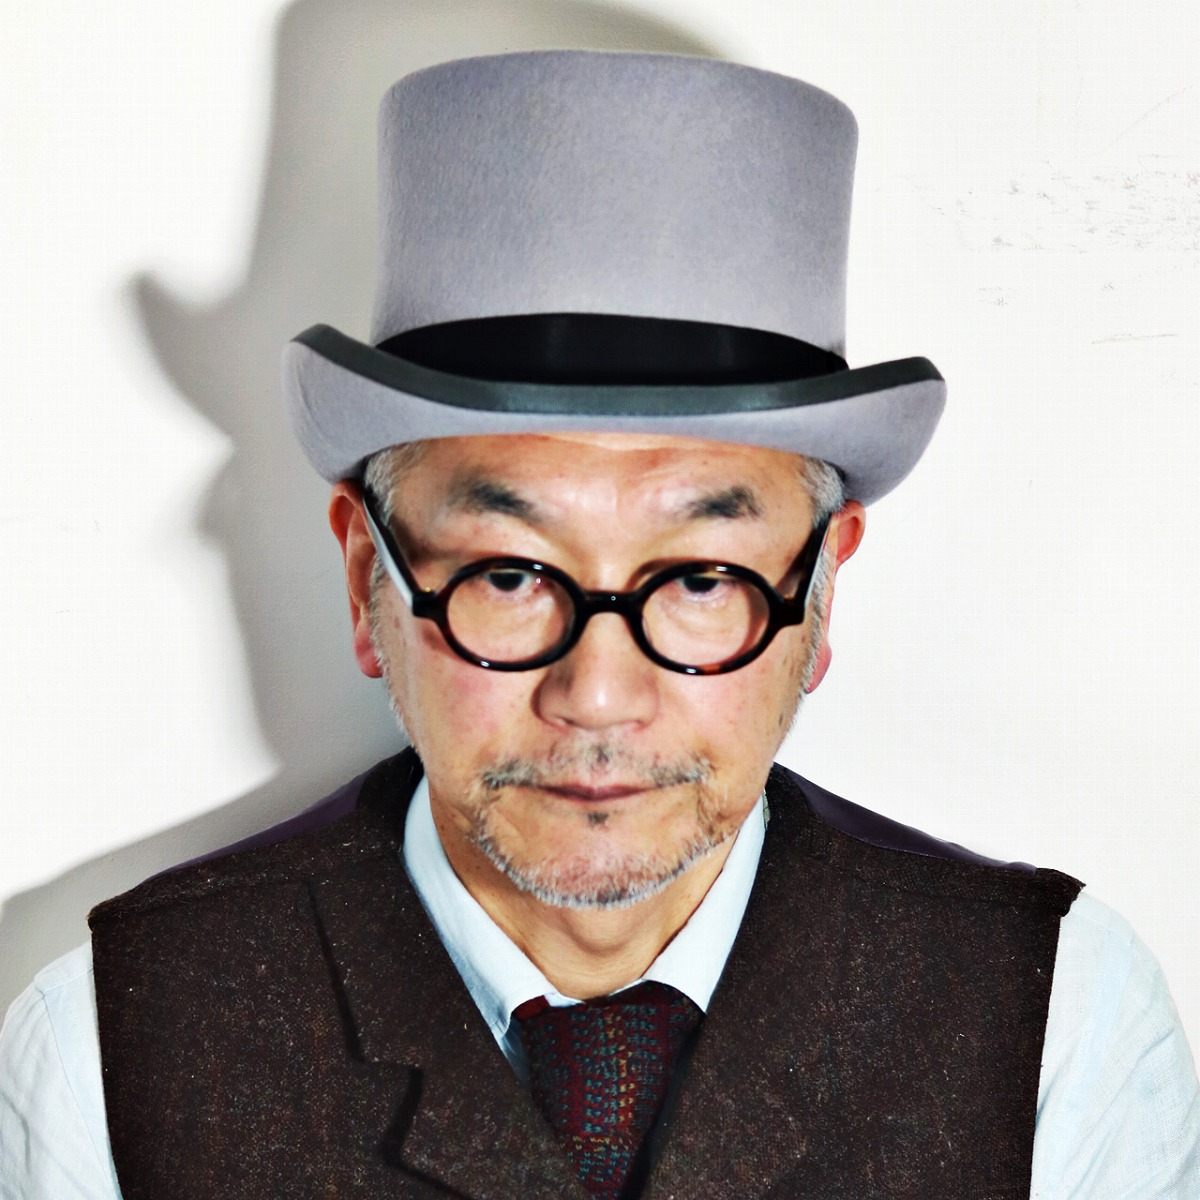 354c1710e518ef ... Christie's London Hat mens fall/winter CHRISTYS ' LONDON Hat Hat wool  100% felt ...